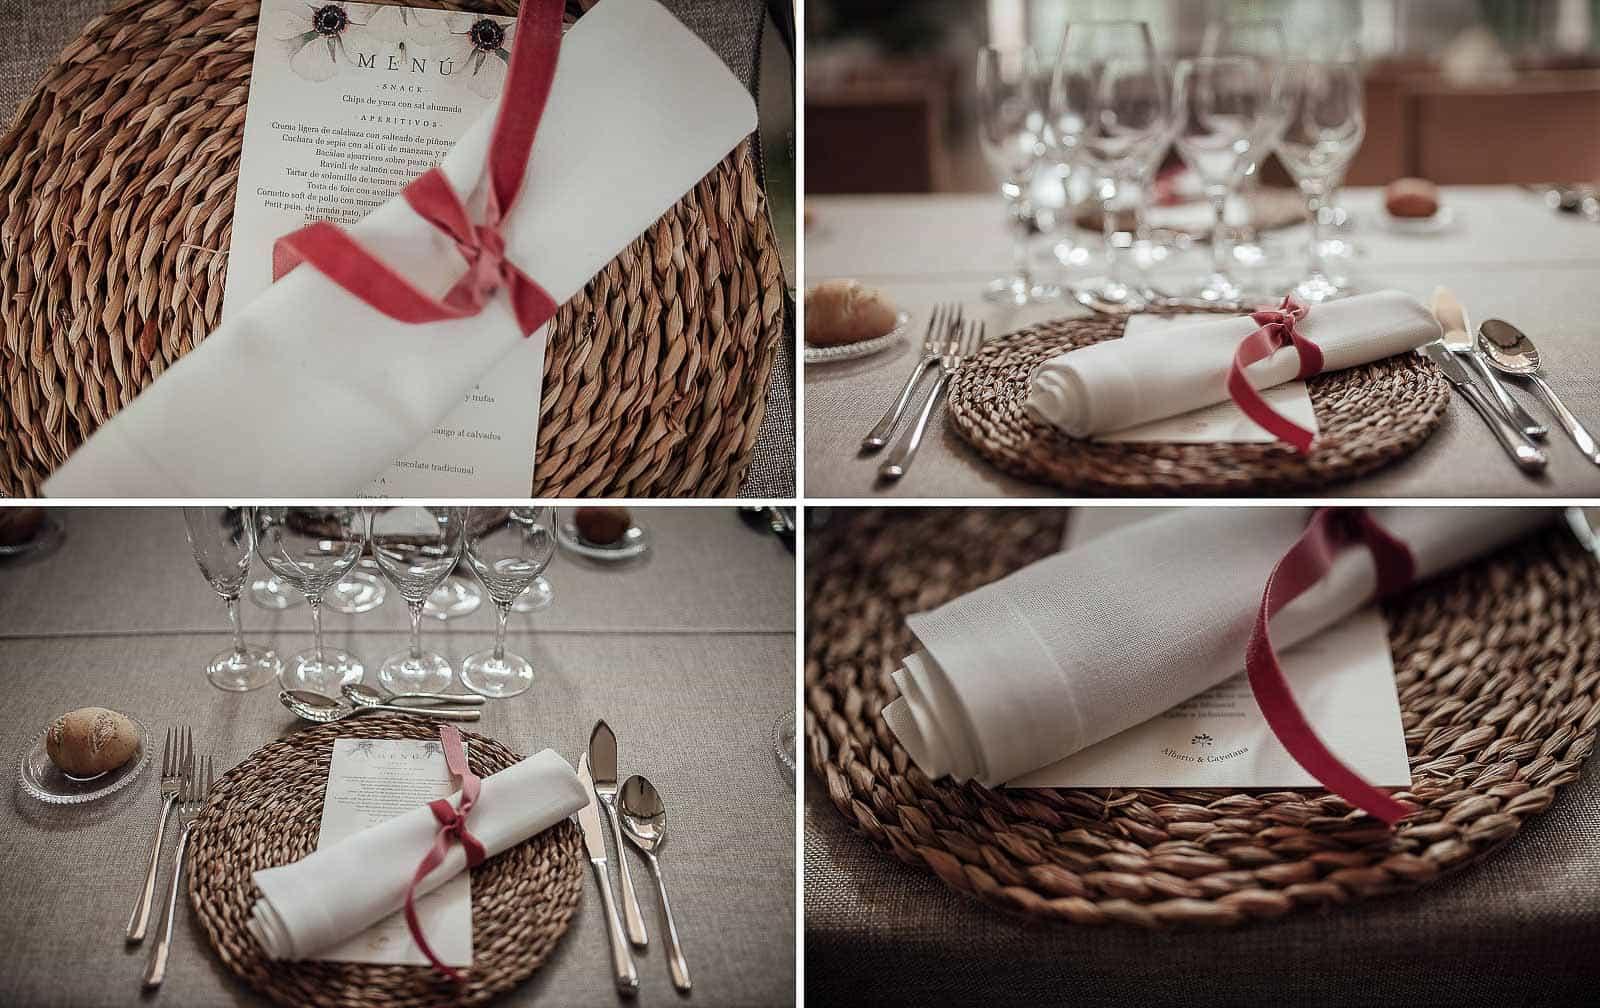 decoracion mesas menu lazo valisse